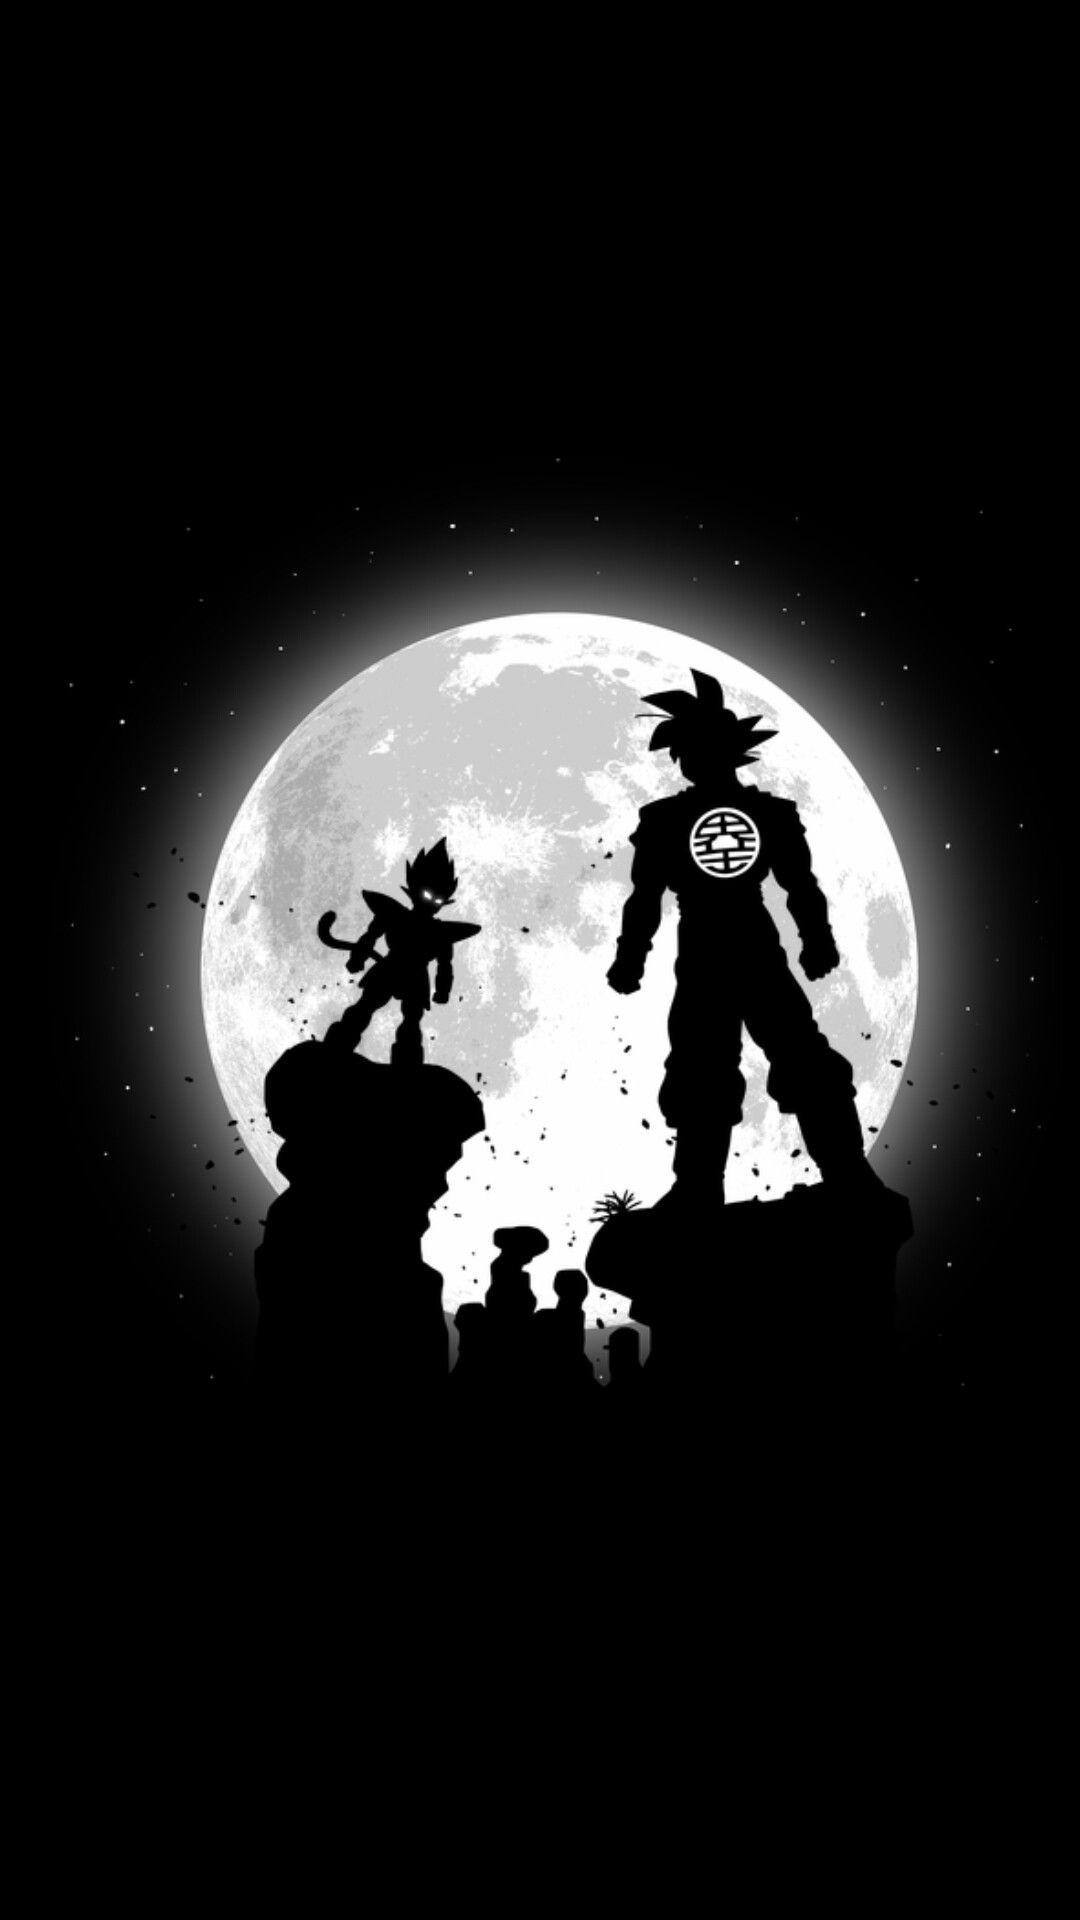 Goku Black Vs Vegeta Wallpapers Wallpaper Cave